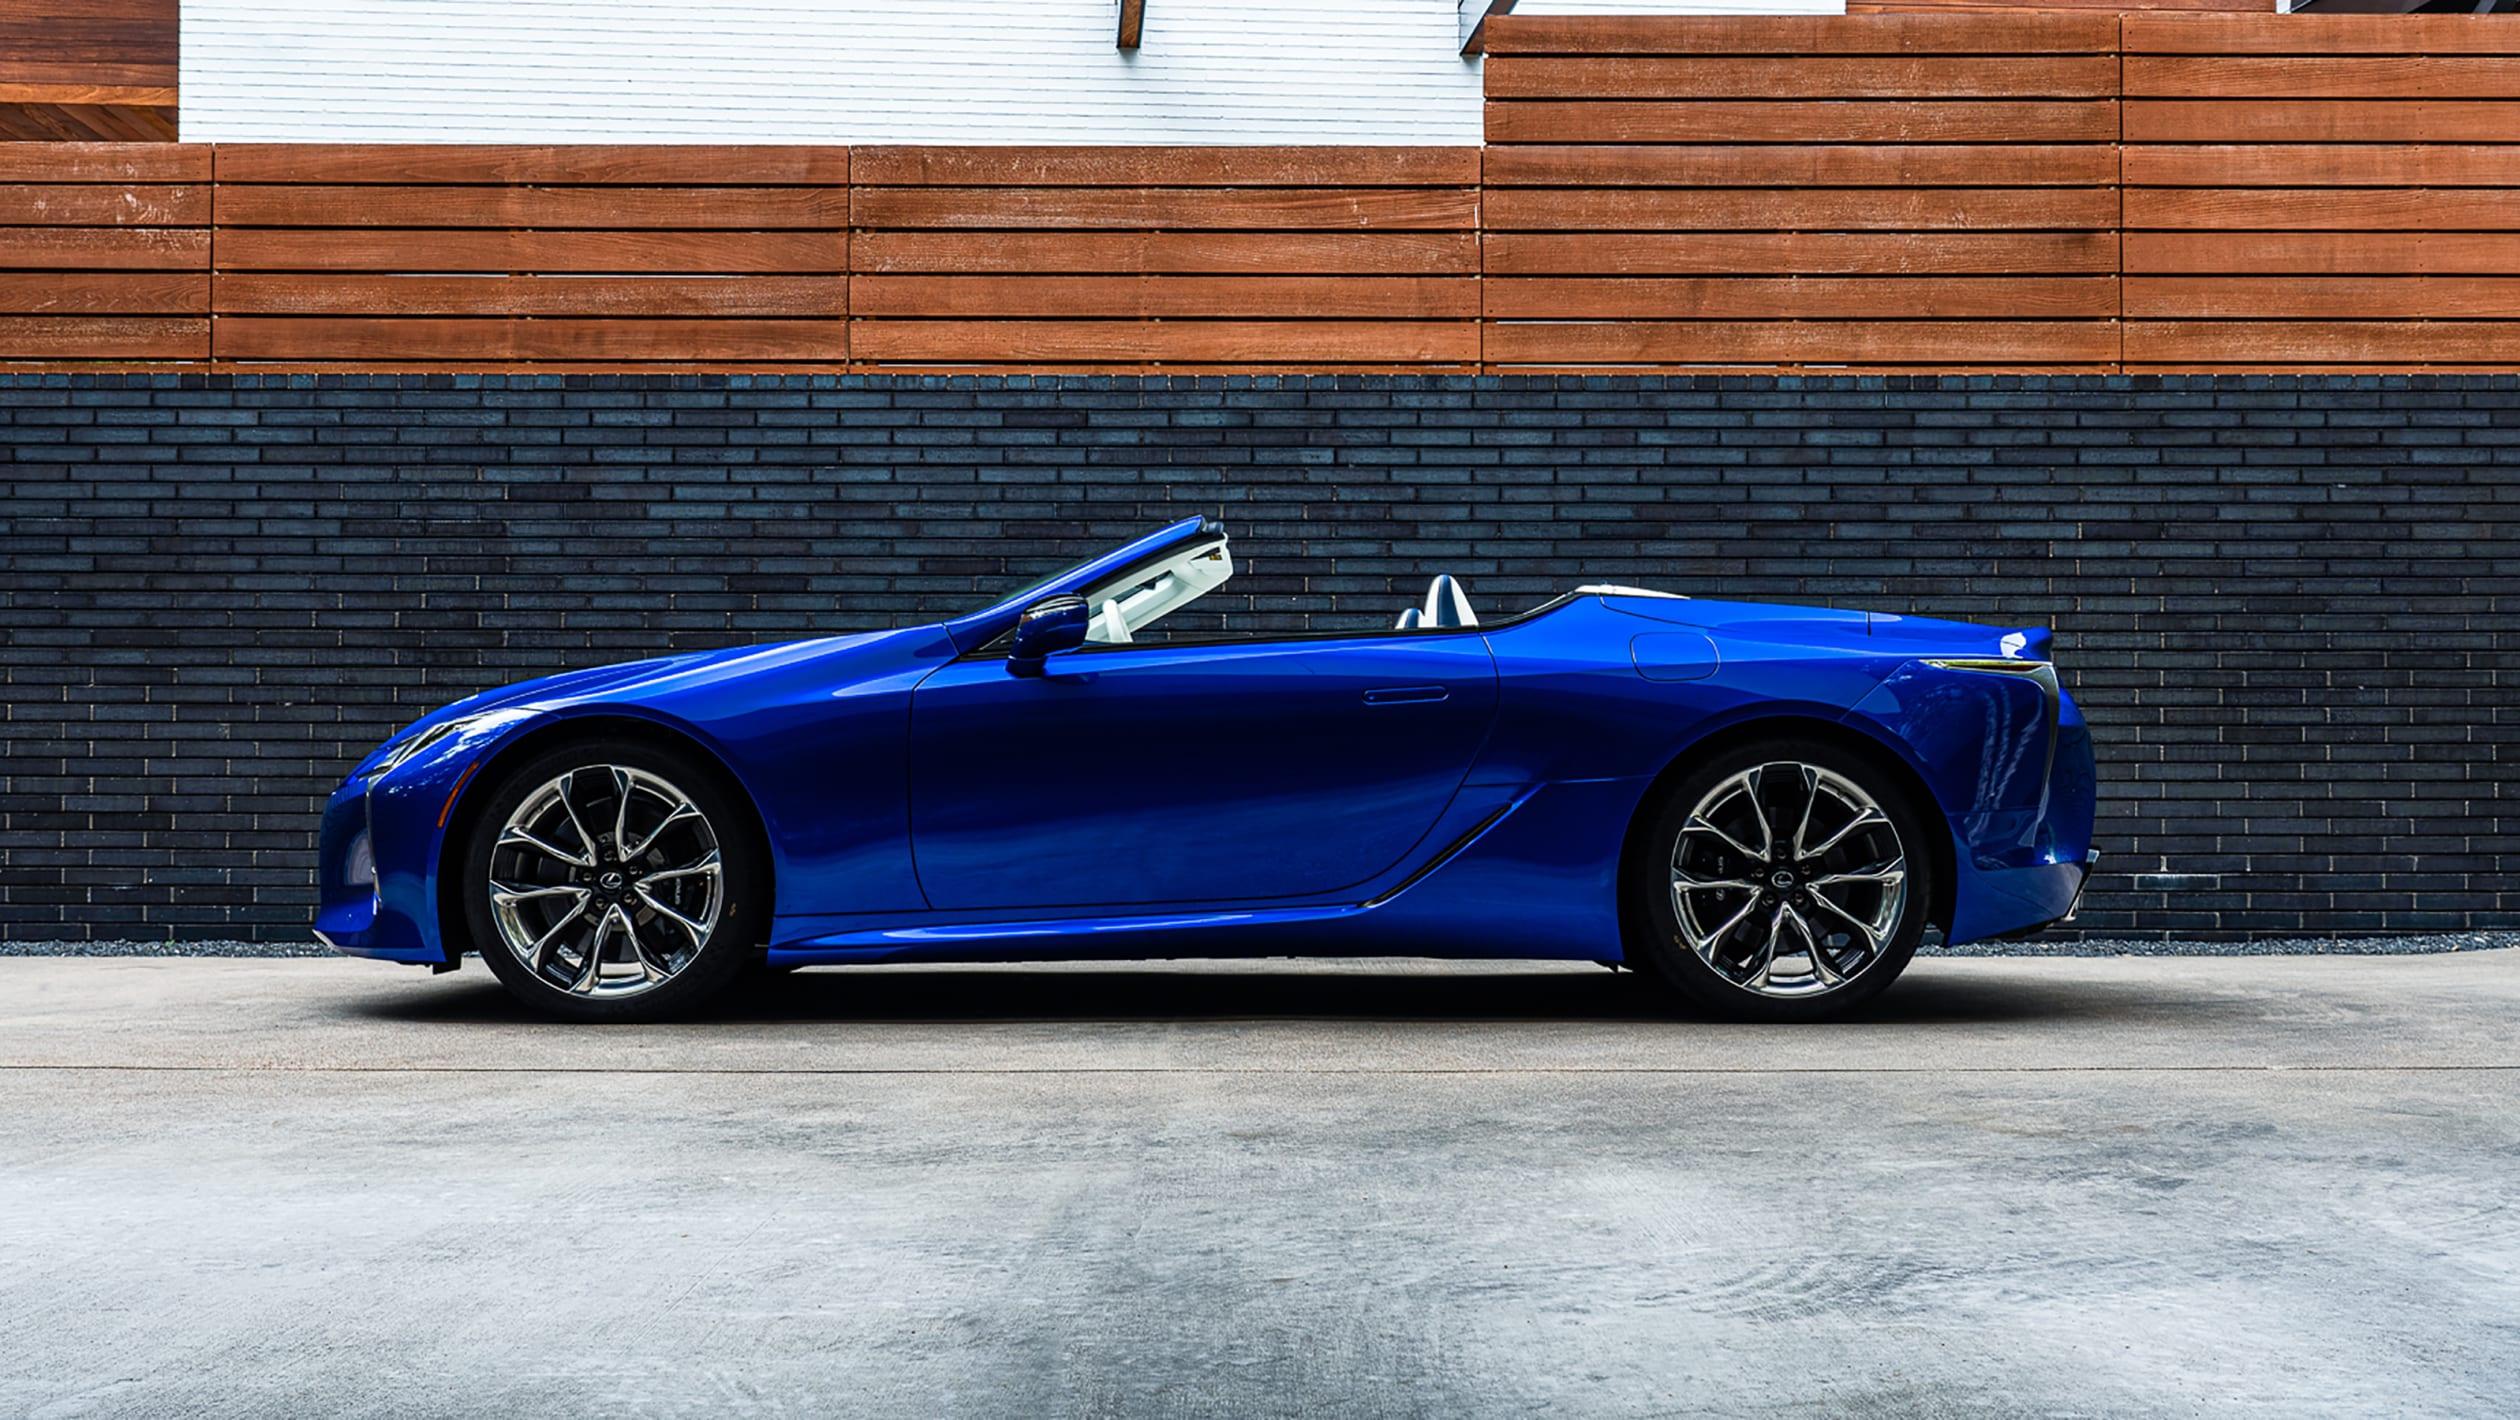 2016 - [Lexus] LC 500 - Page 8 Lexus%20LC%20500%20Convertible%20Regatta-4